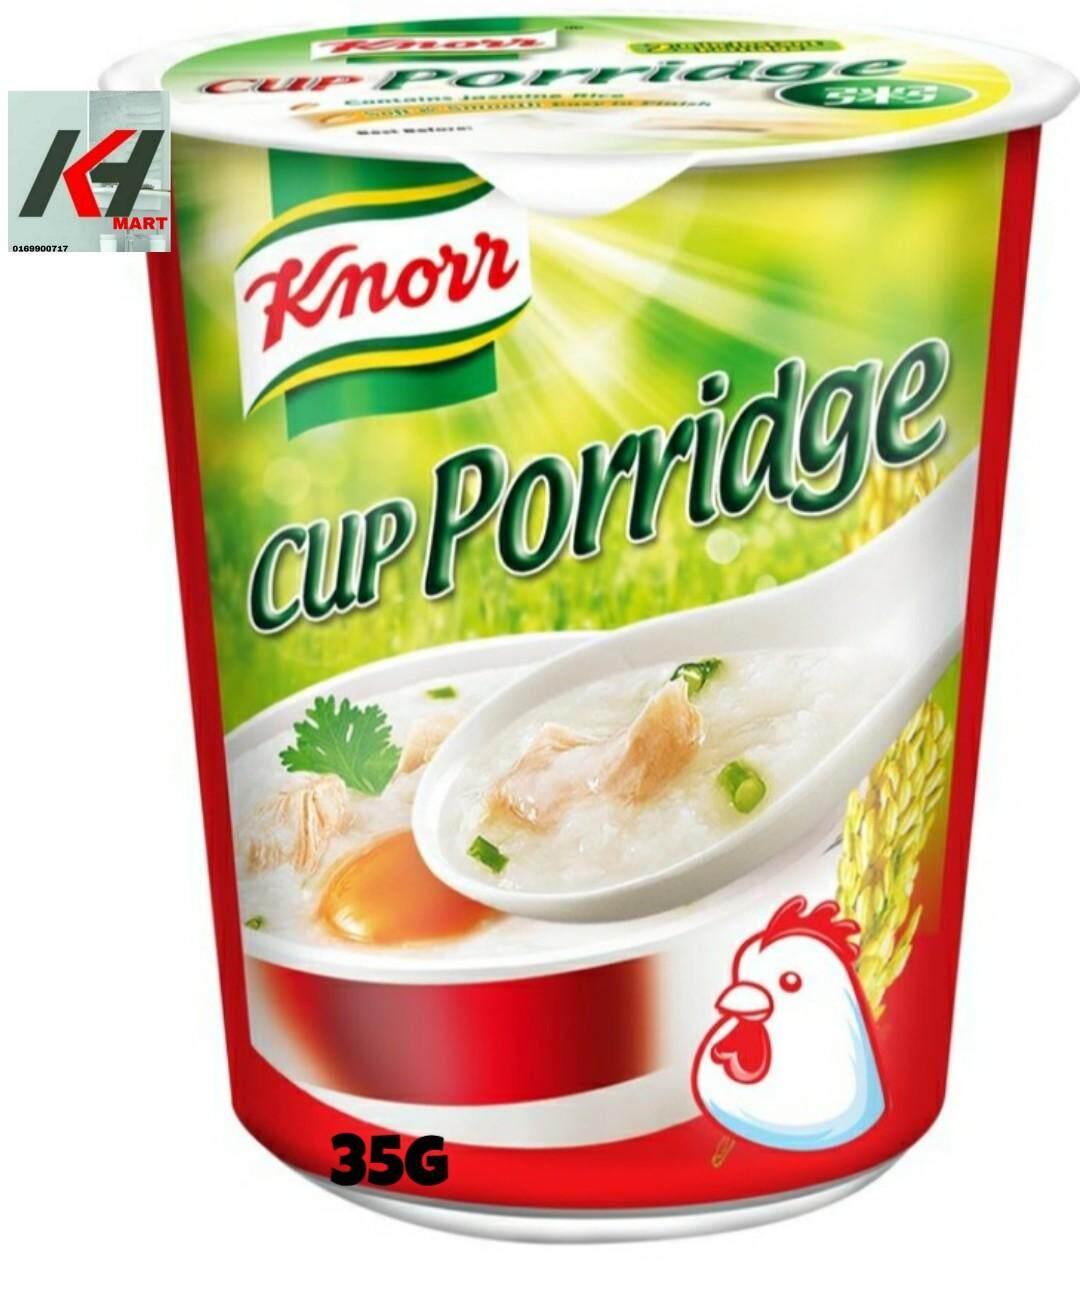 KNORR CUP PORRIDGE PERISA AYAM 35G READY STOCK